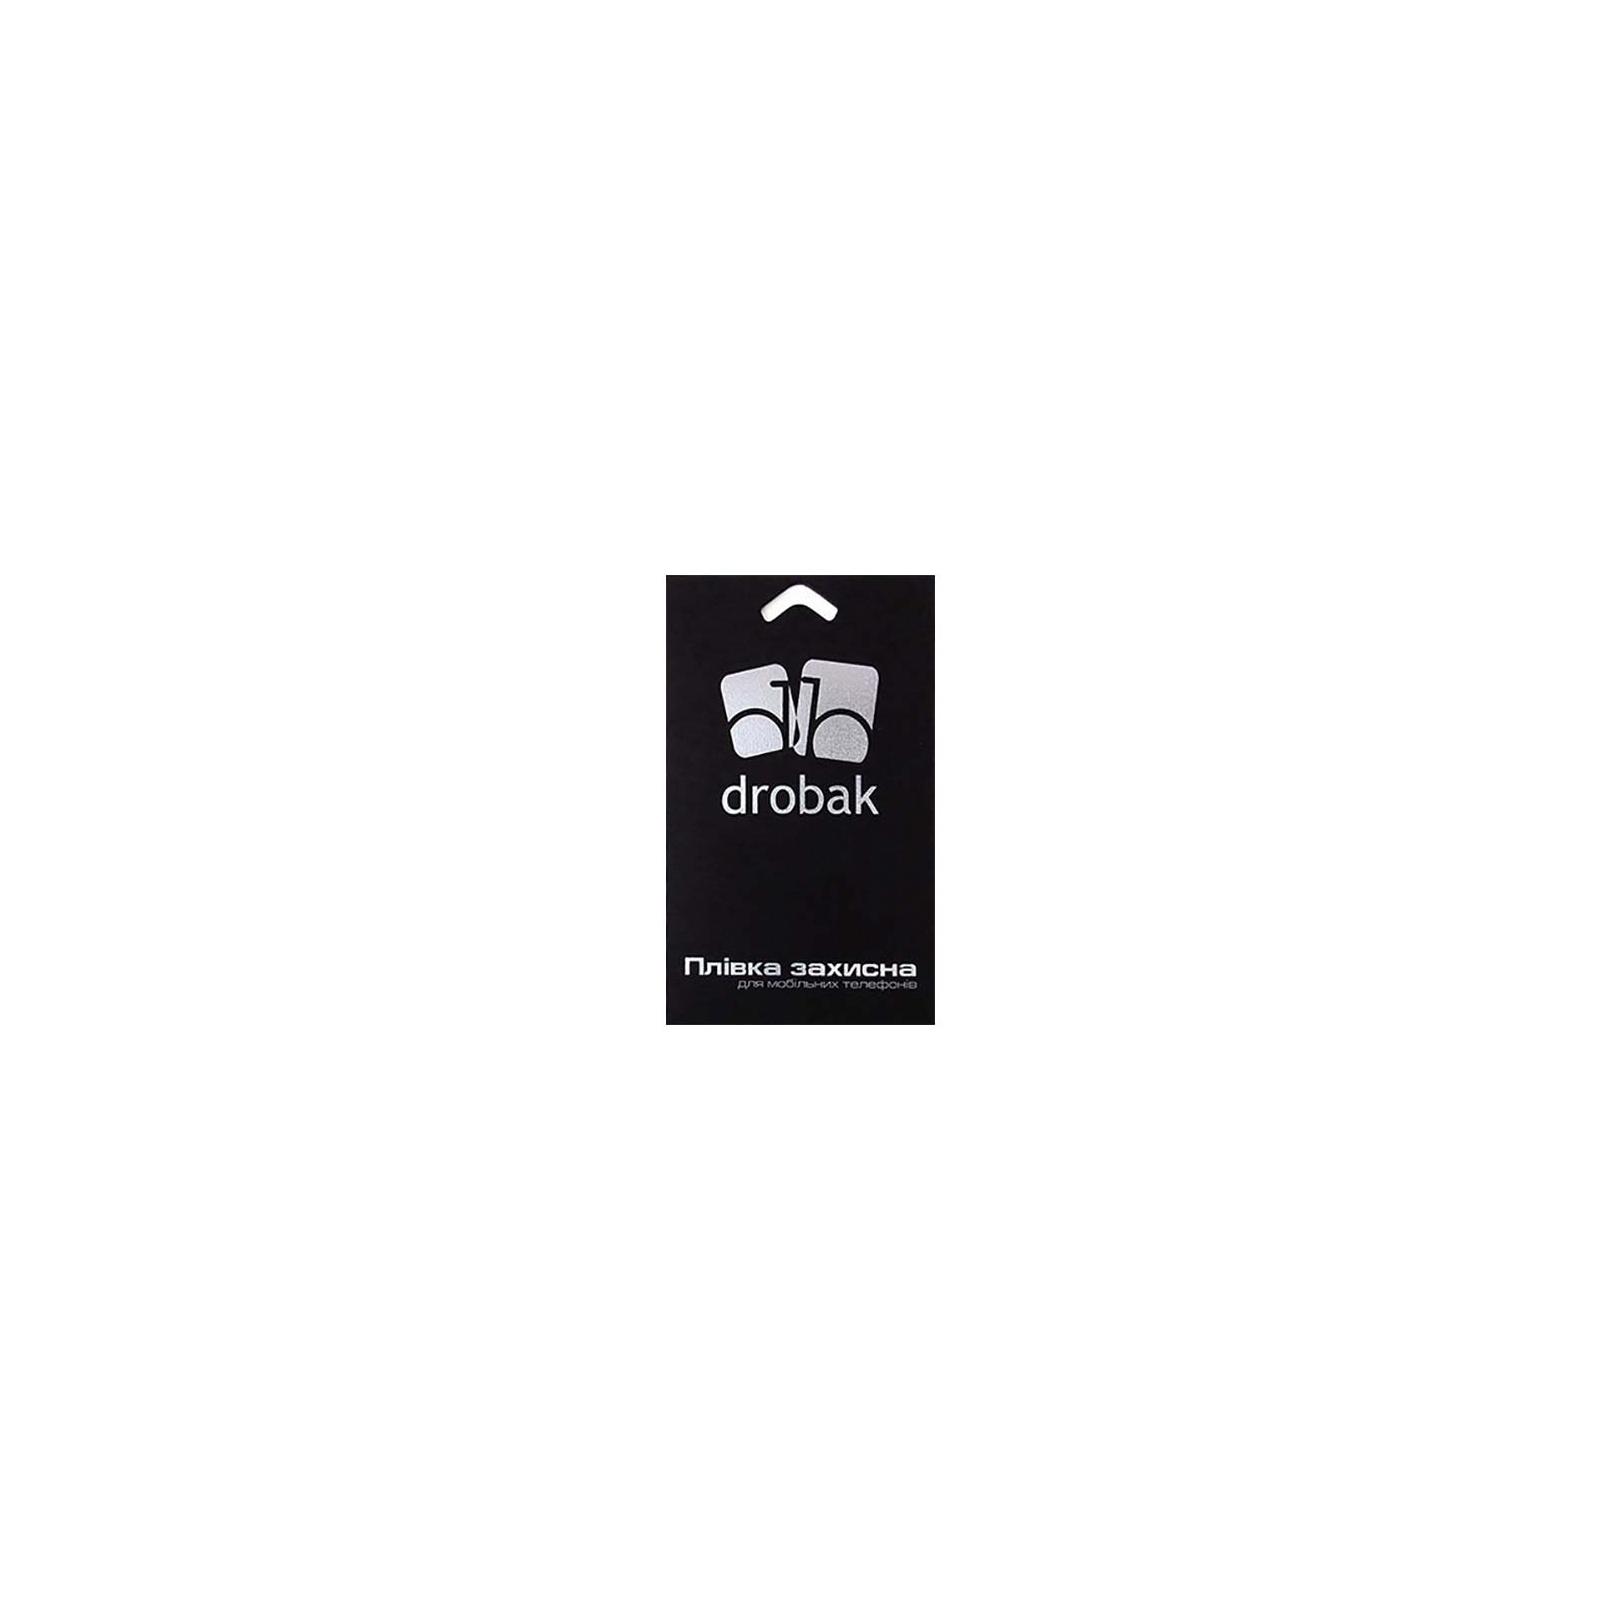 Пленка защитная Drobak для Nokia X (505123)